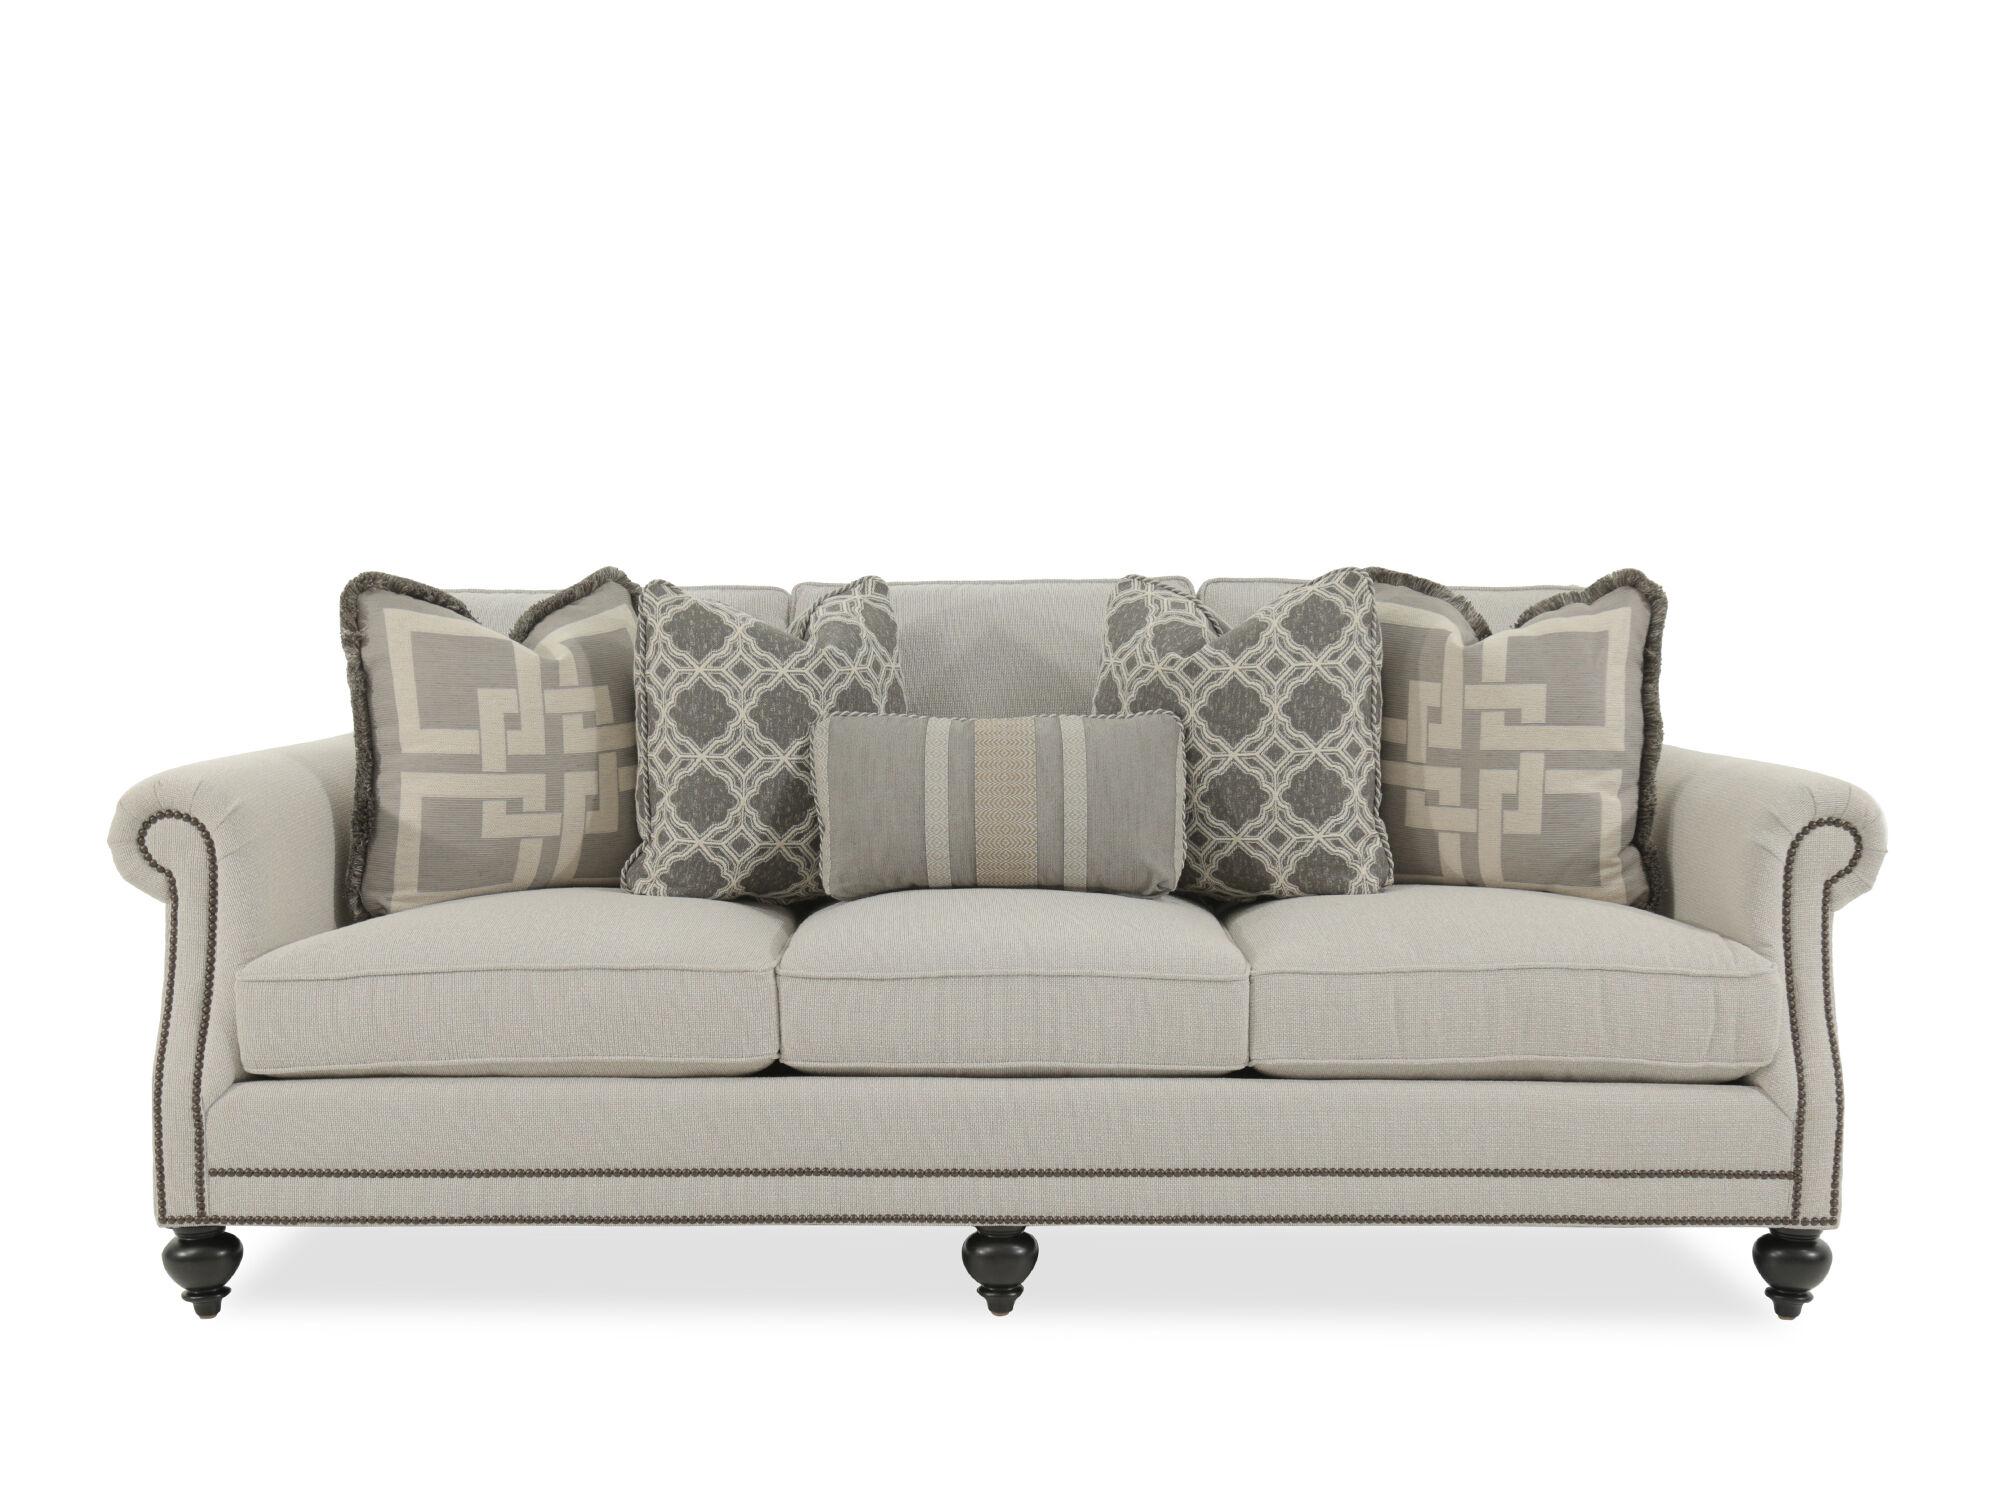 Beau Nailhead Accented 92.5u0026quot; Rolled Arm Sofa ...